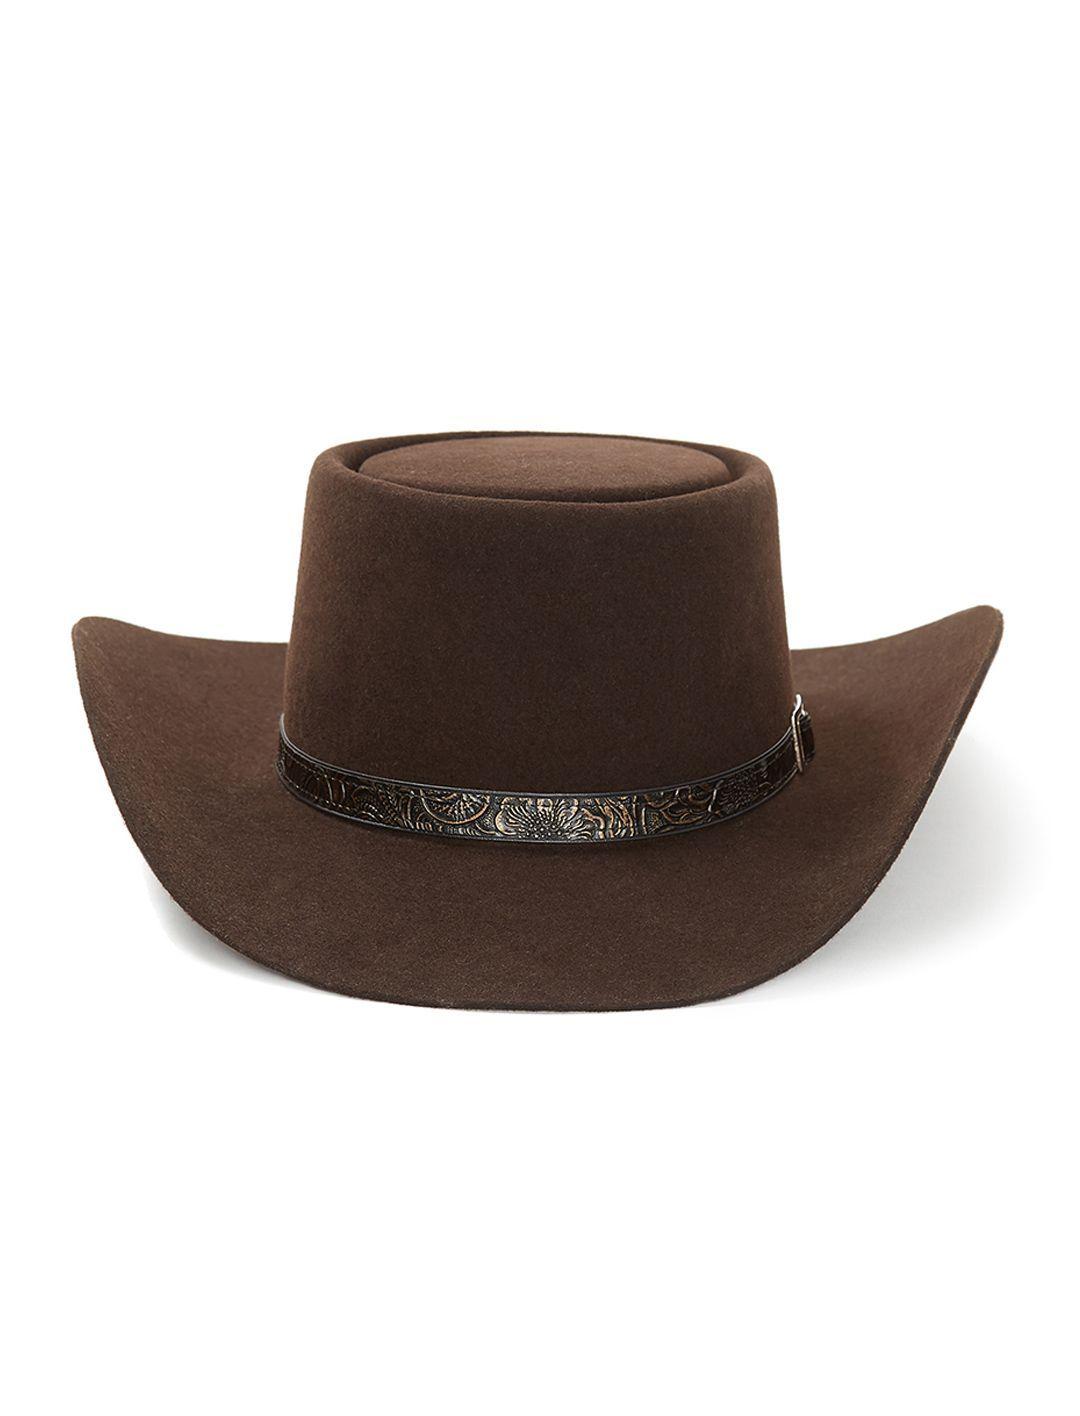 9914ccb7 Stetson Men's Revenger 4X Cowboy Hat SBRVGR-4634. Details